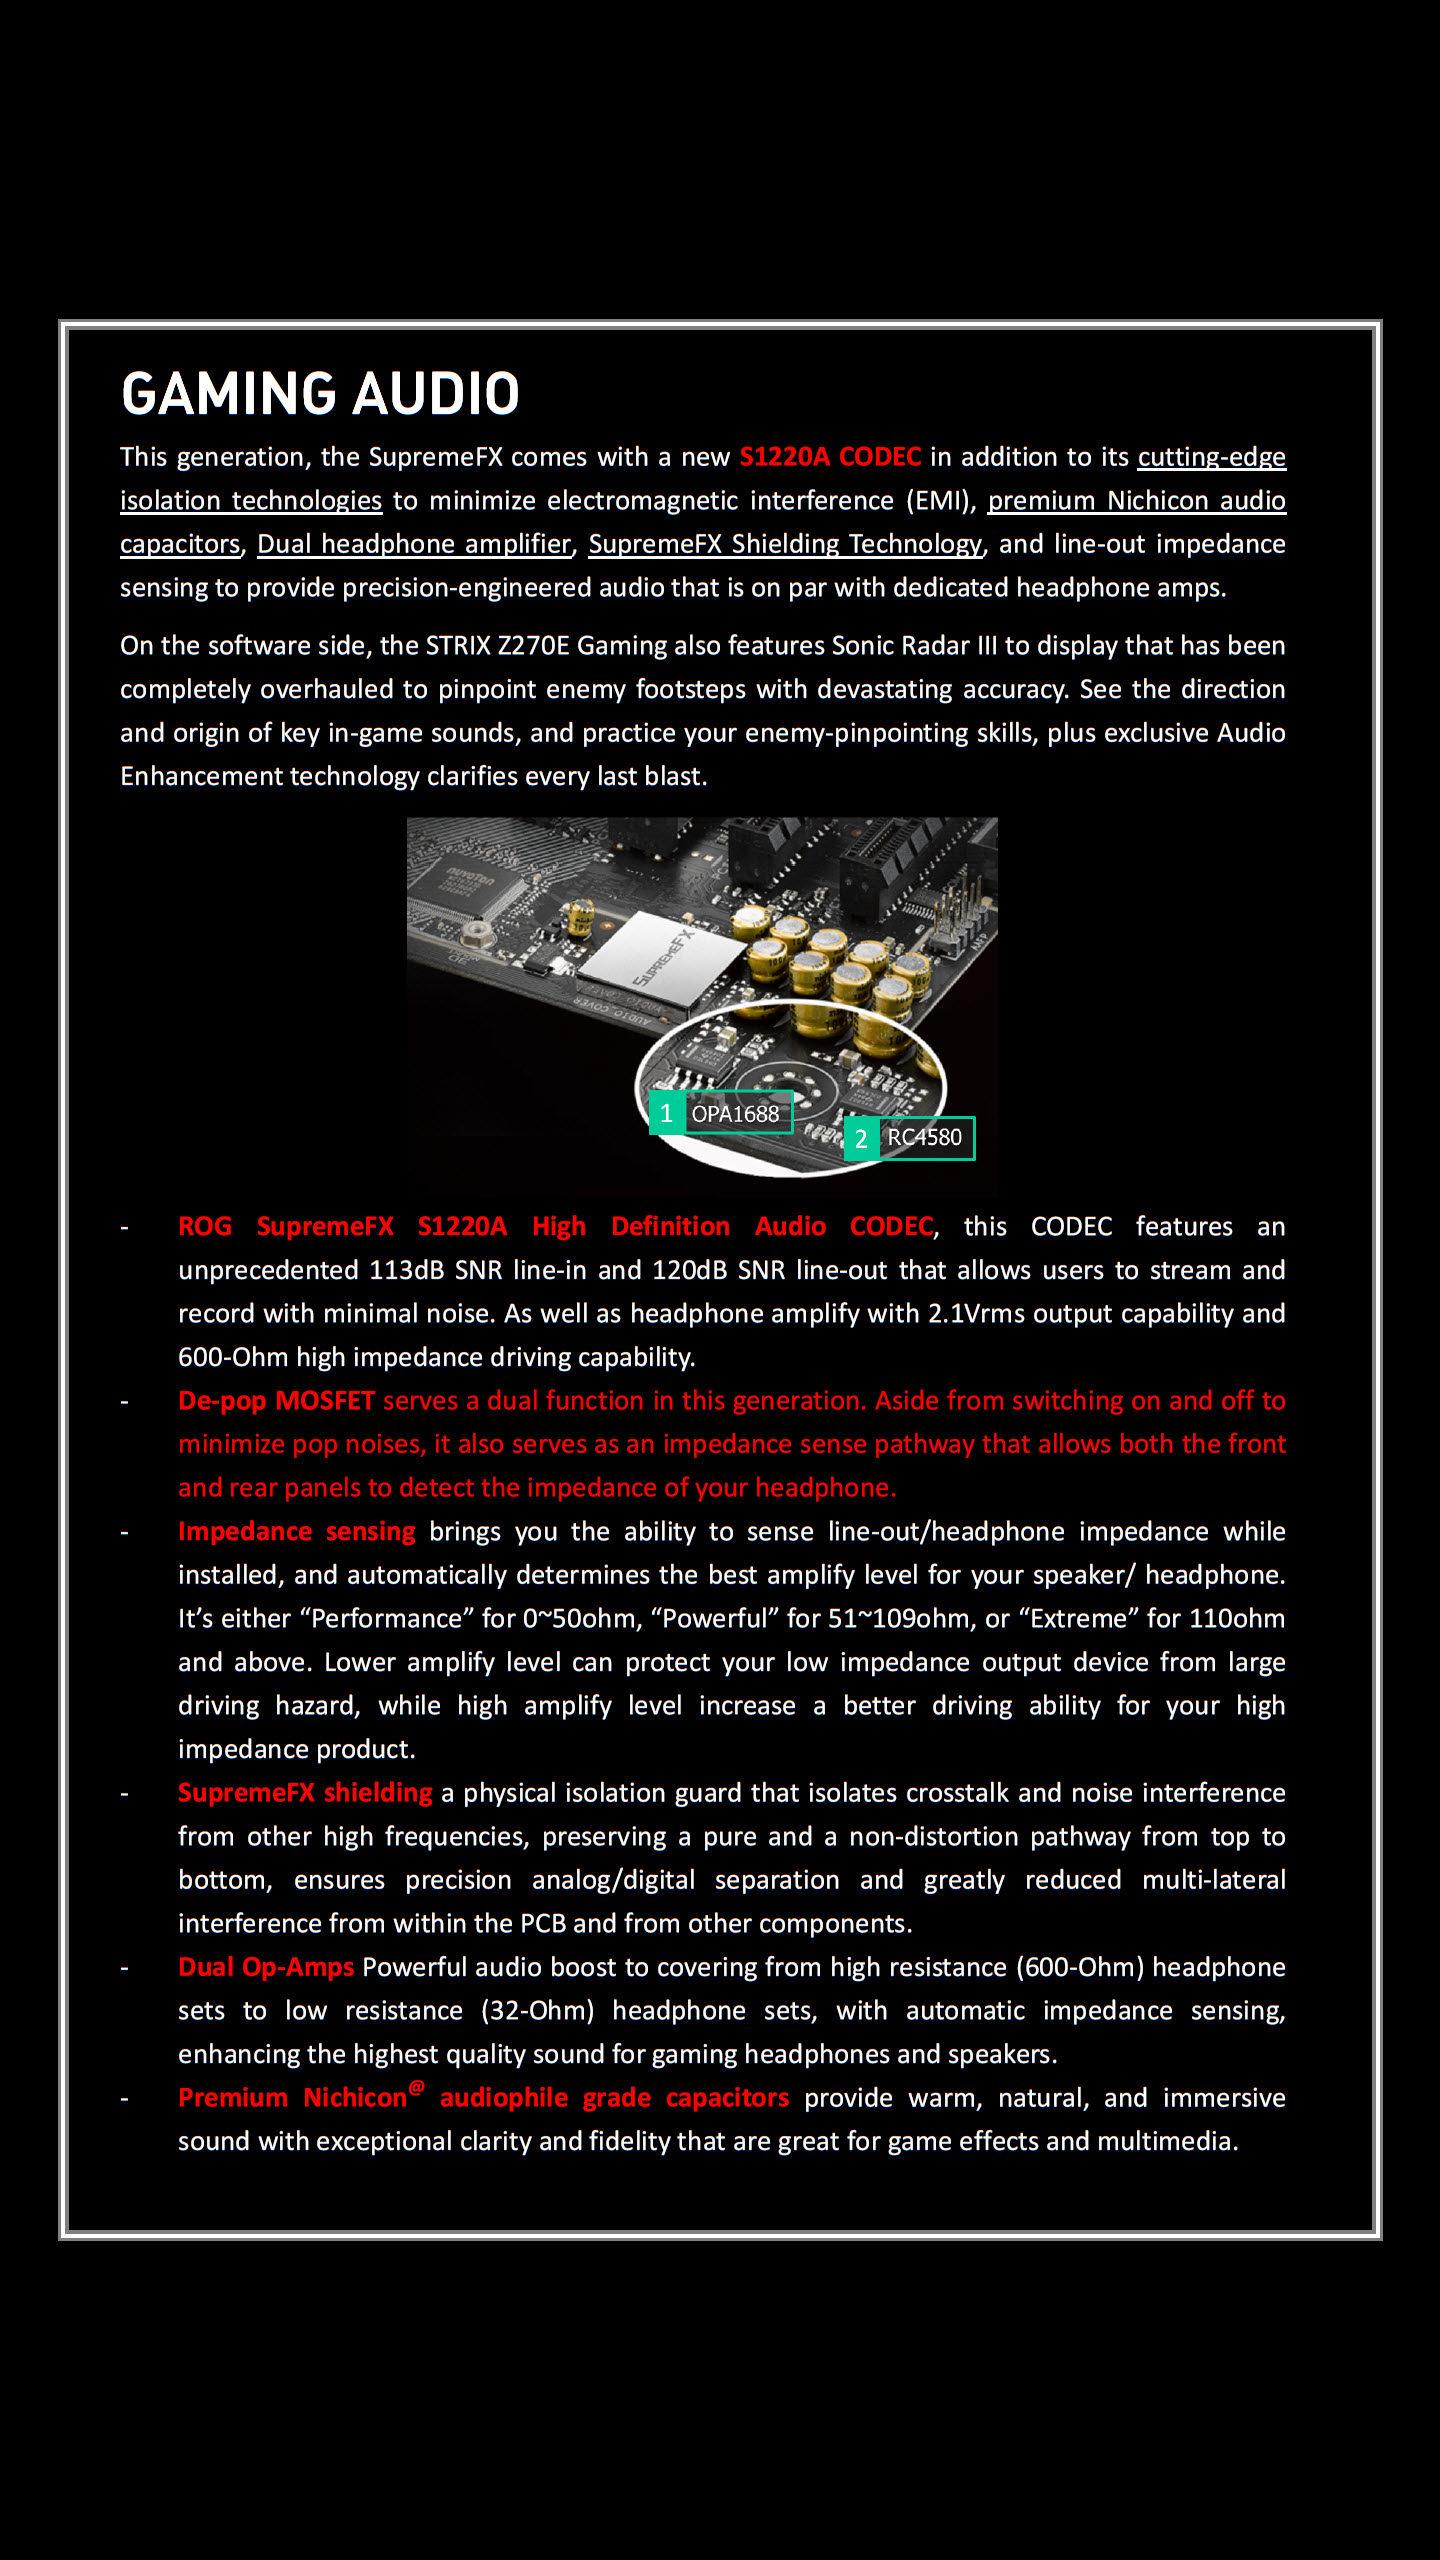 ASUS STRIX Z270E Gaming Z270 LGA 1151 Motherboard Review – ASUS